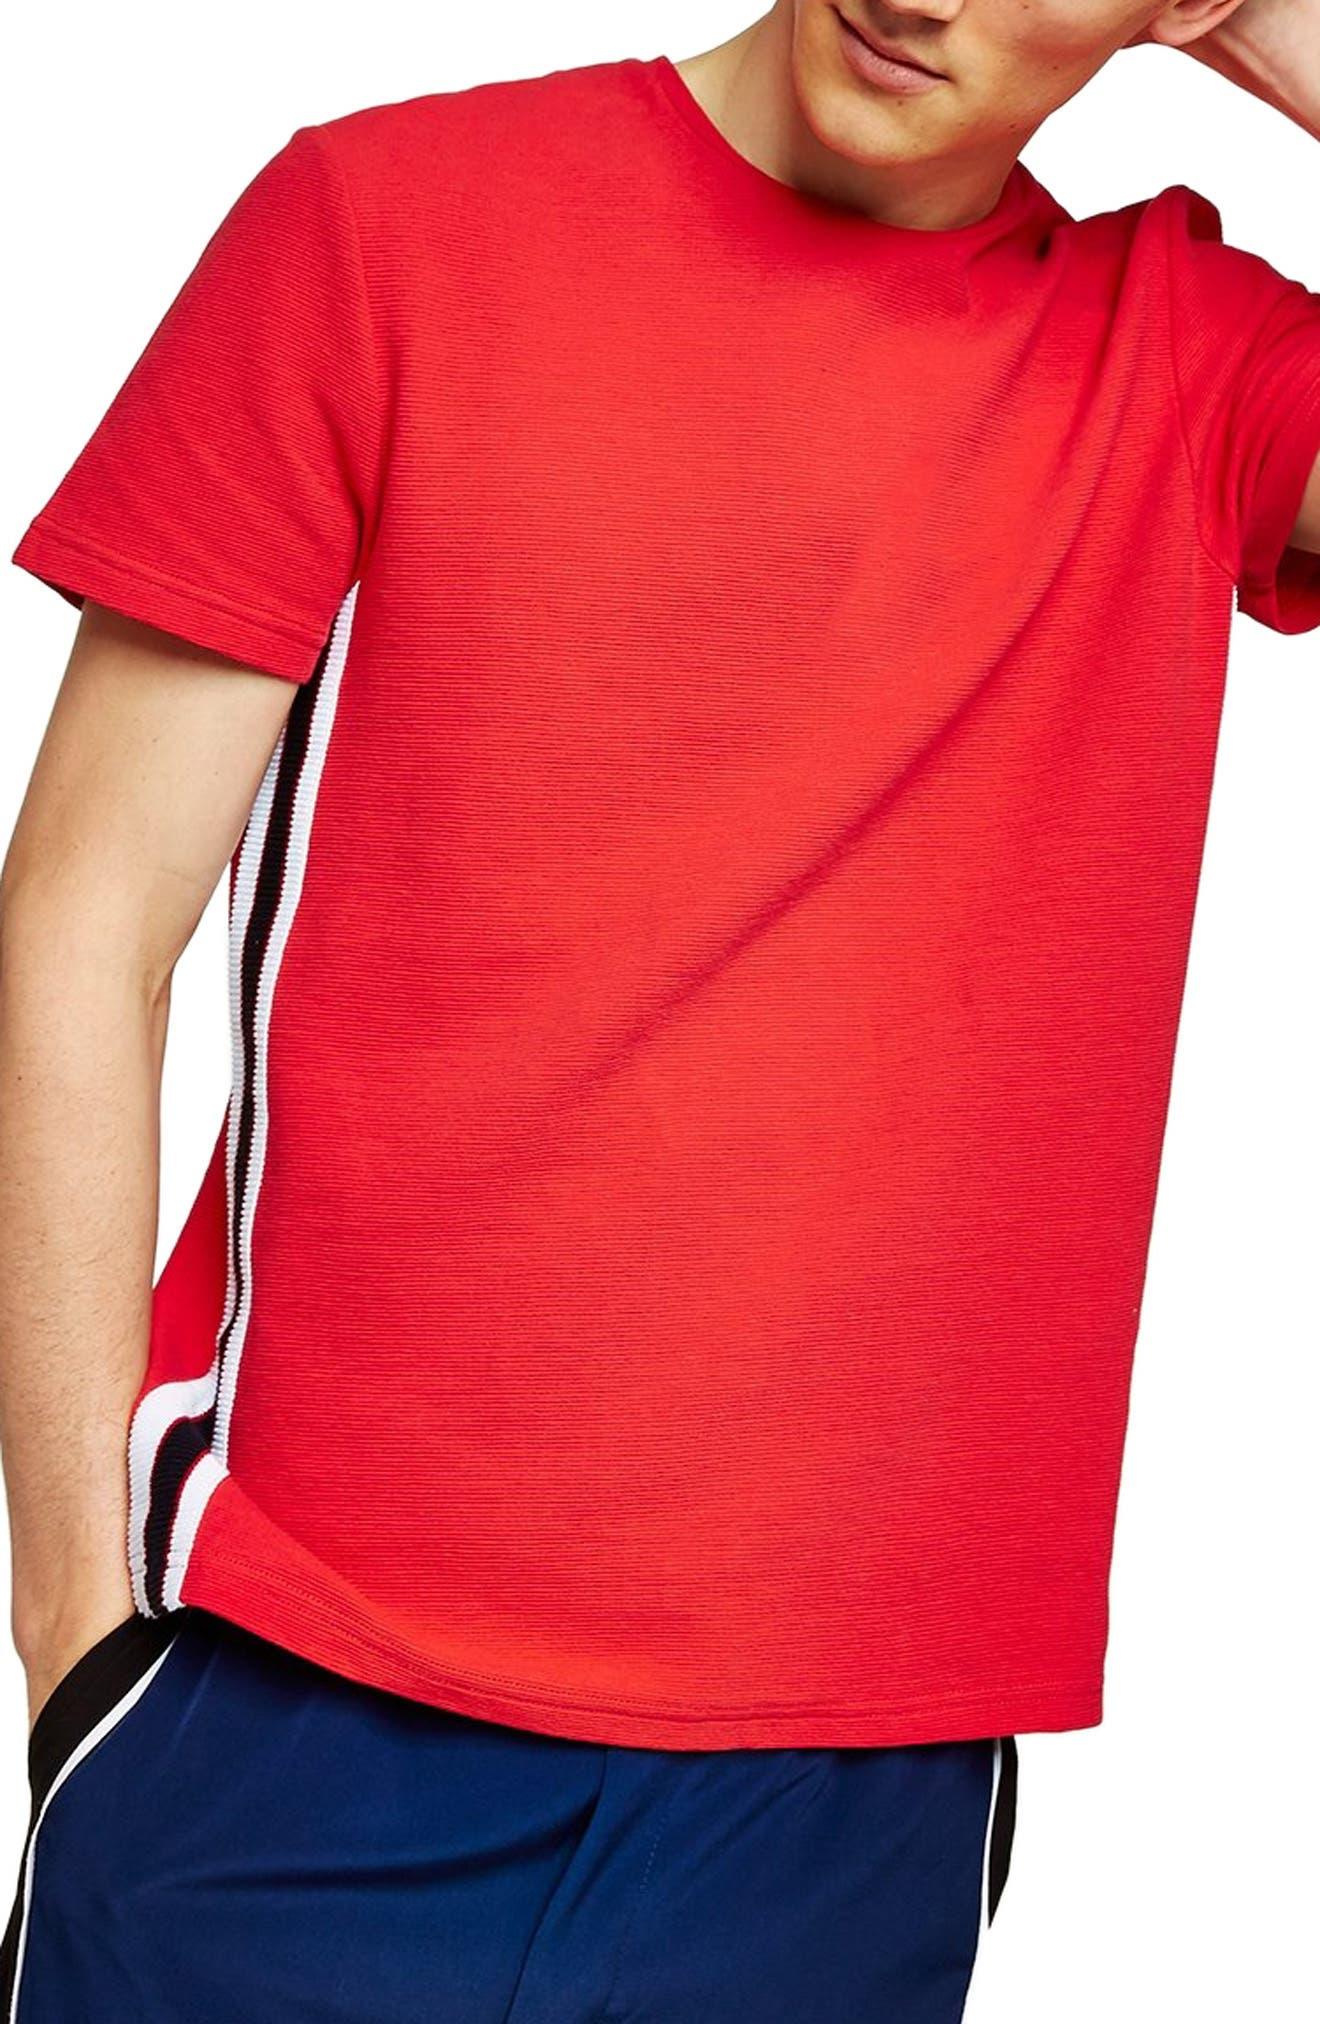 Taping Classic Fit T-Shirt,                             Main thumbnail 1, color,                             600